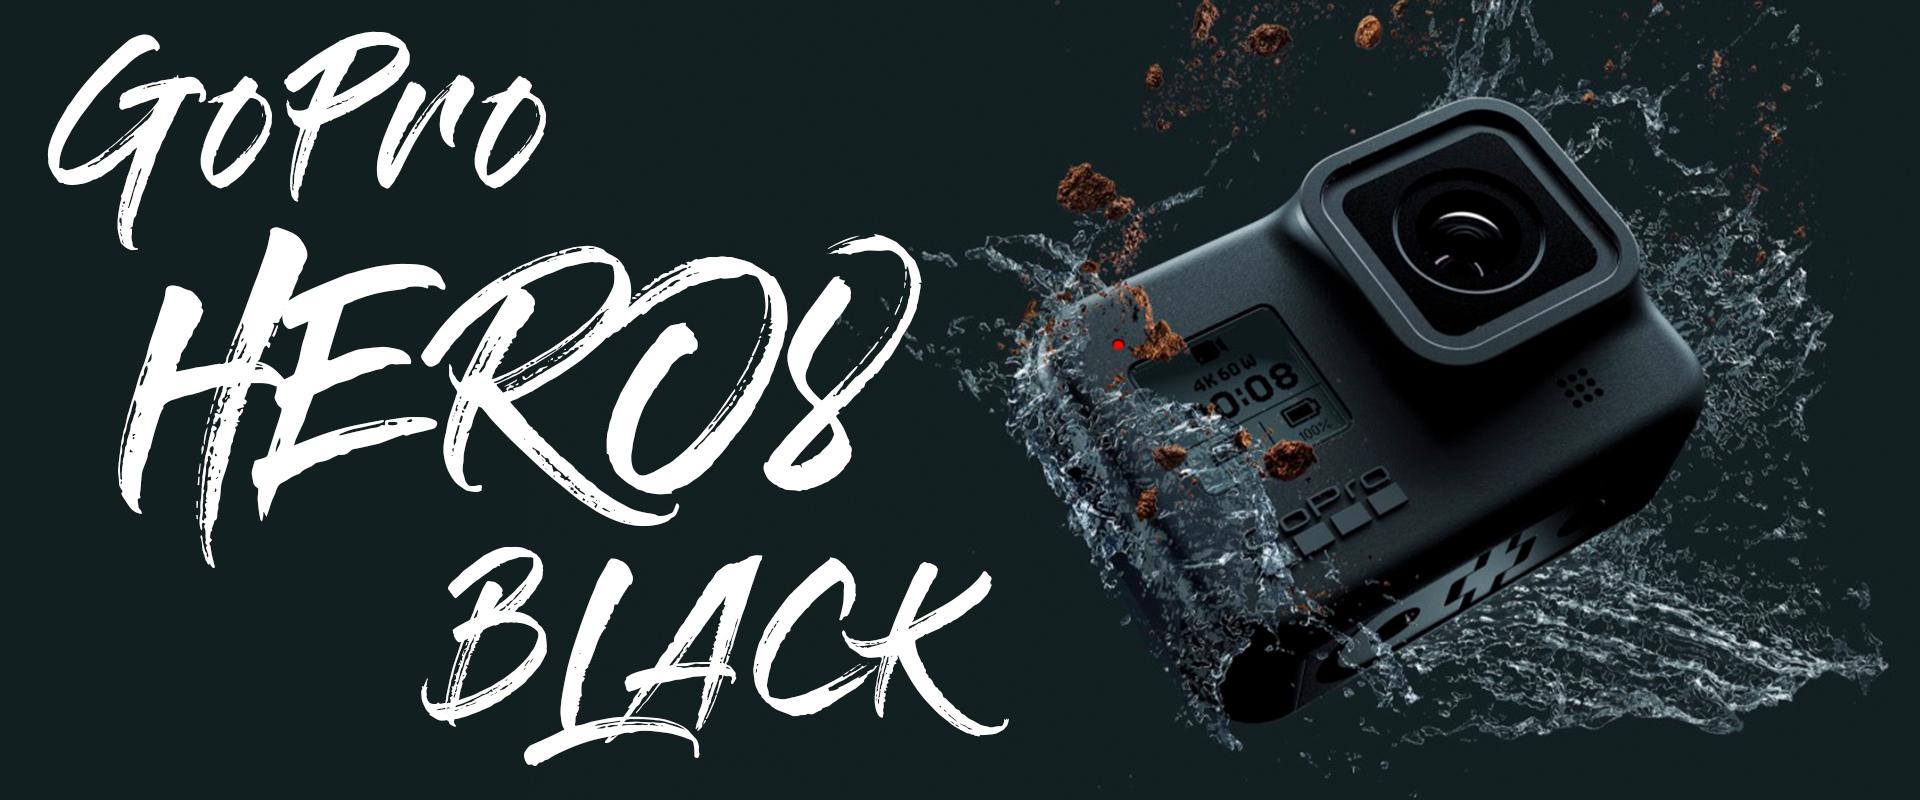 GoPro Hero8 Black強勢降臨!擁有更流暢的防手震 Liveburst超強功能 加強夜拍低光拍攝 夜間縮時攝影 facebook直播串流高達1080P